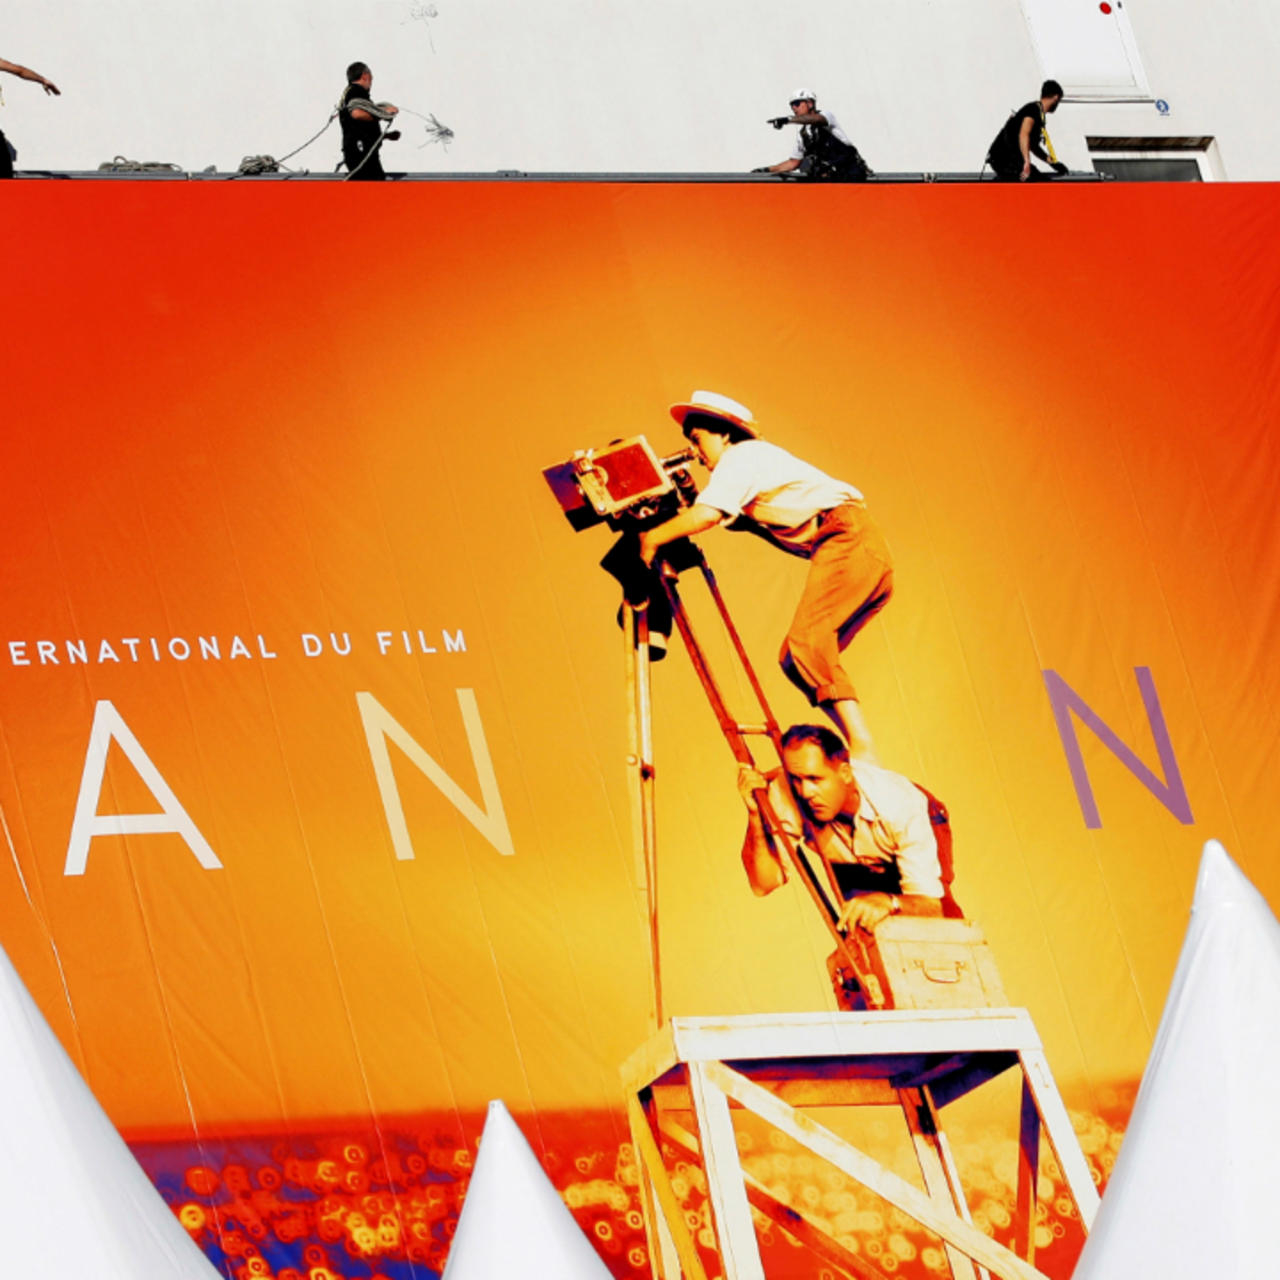 Imagen de archivo del Festival de Cannes